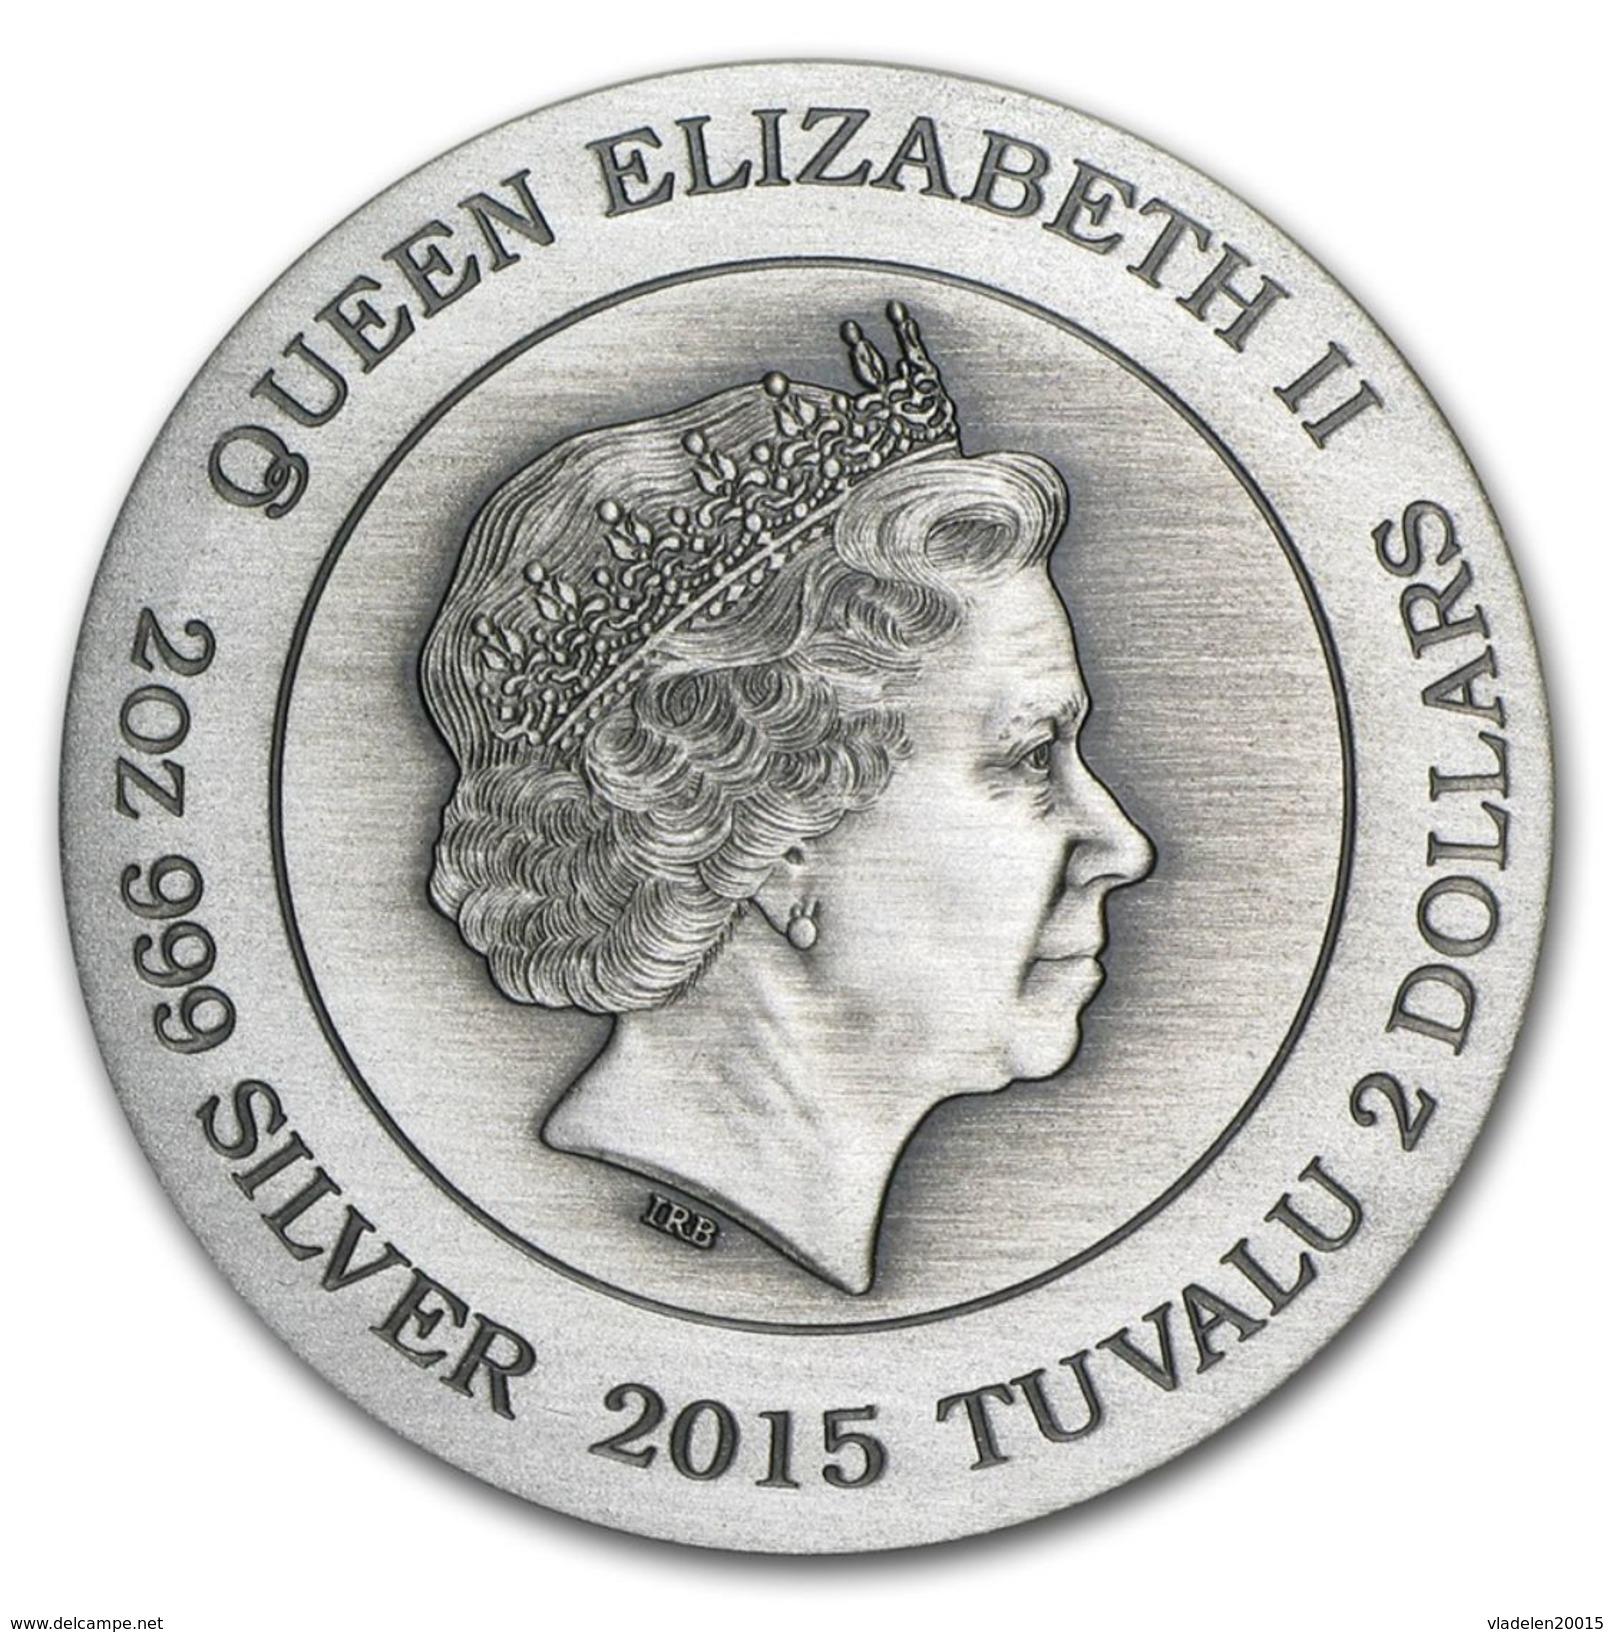 2015 Tuvalu 2 Ounces Silver Goddess Olympus Hera (HR) - Tuvalu